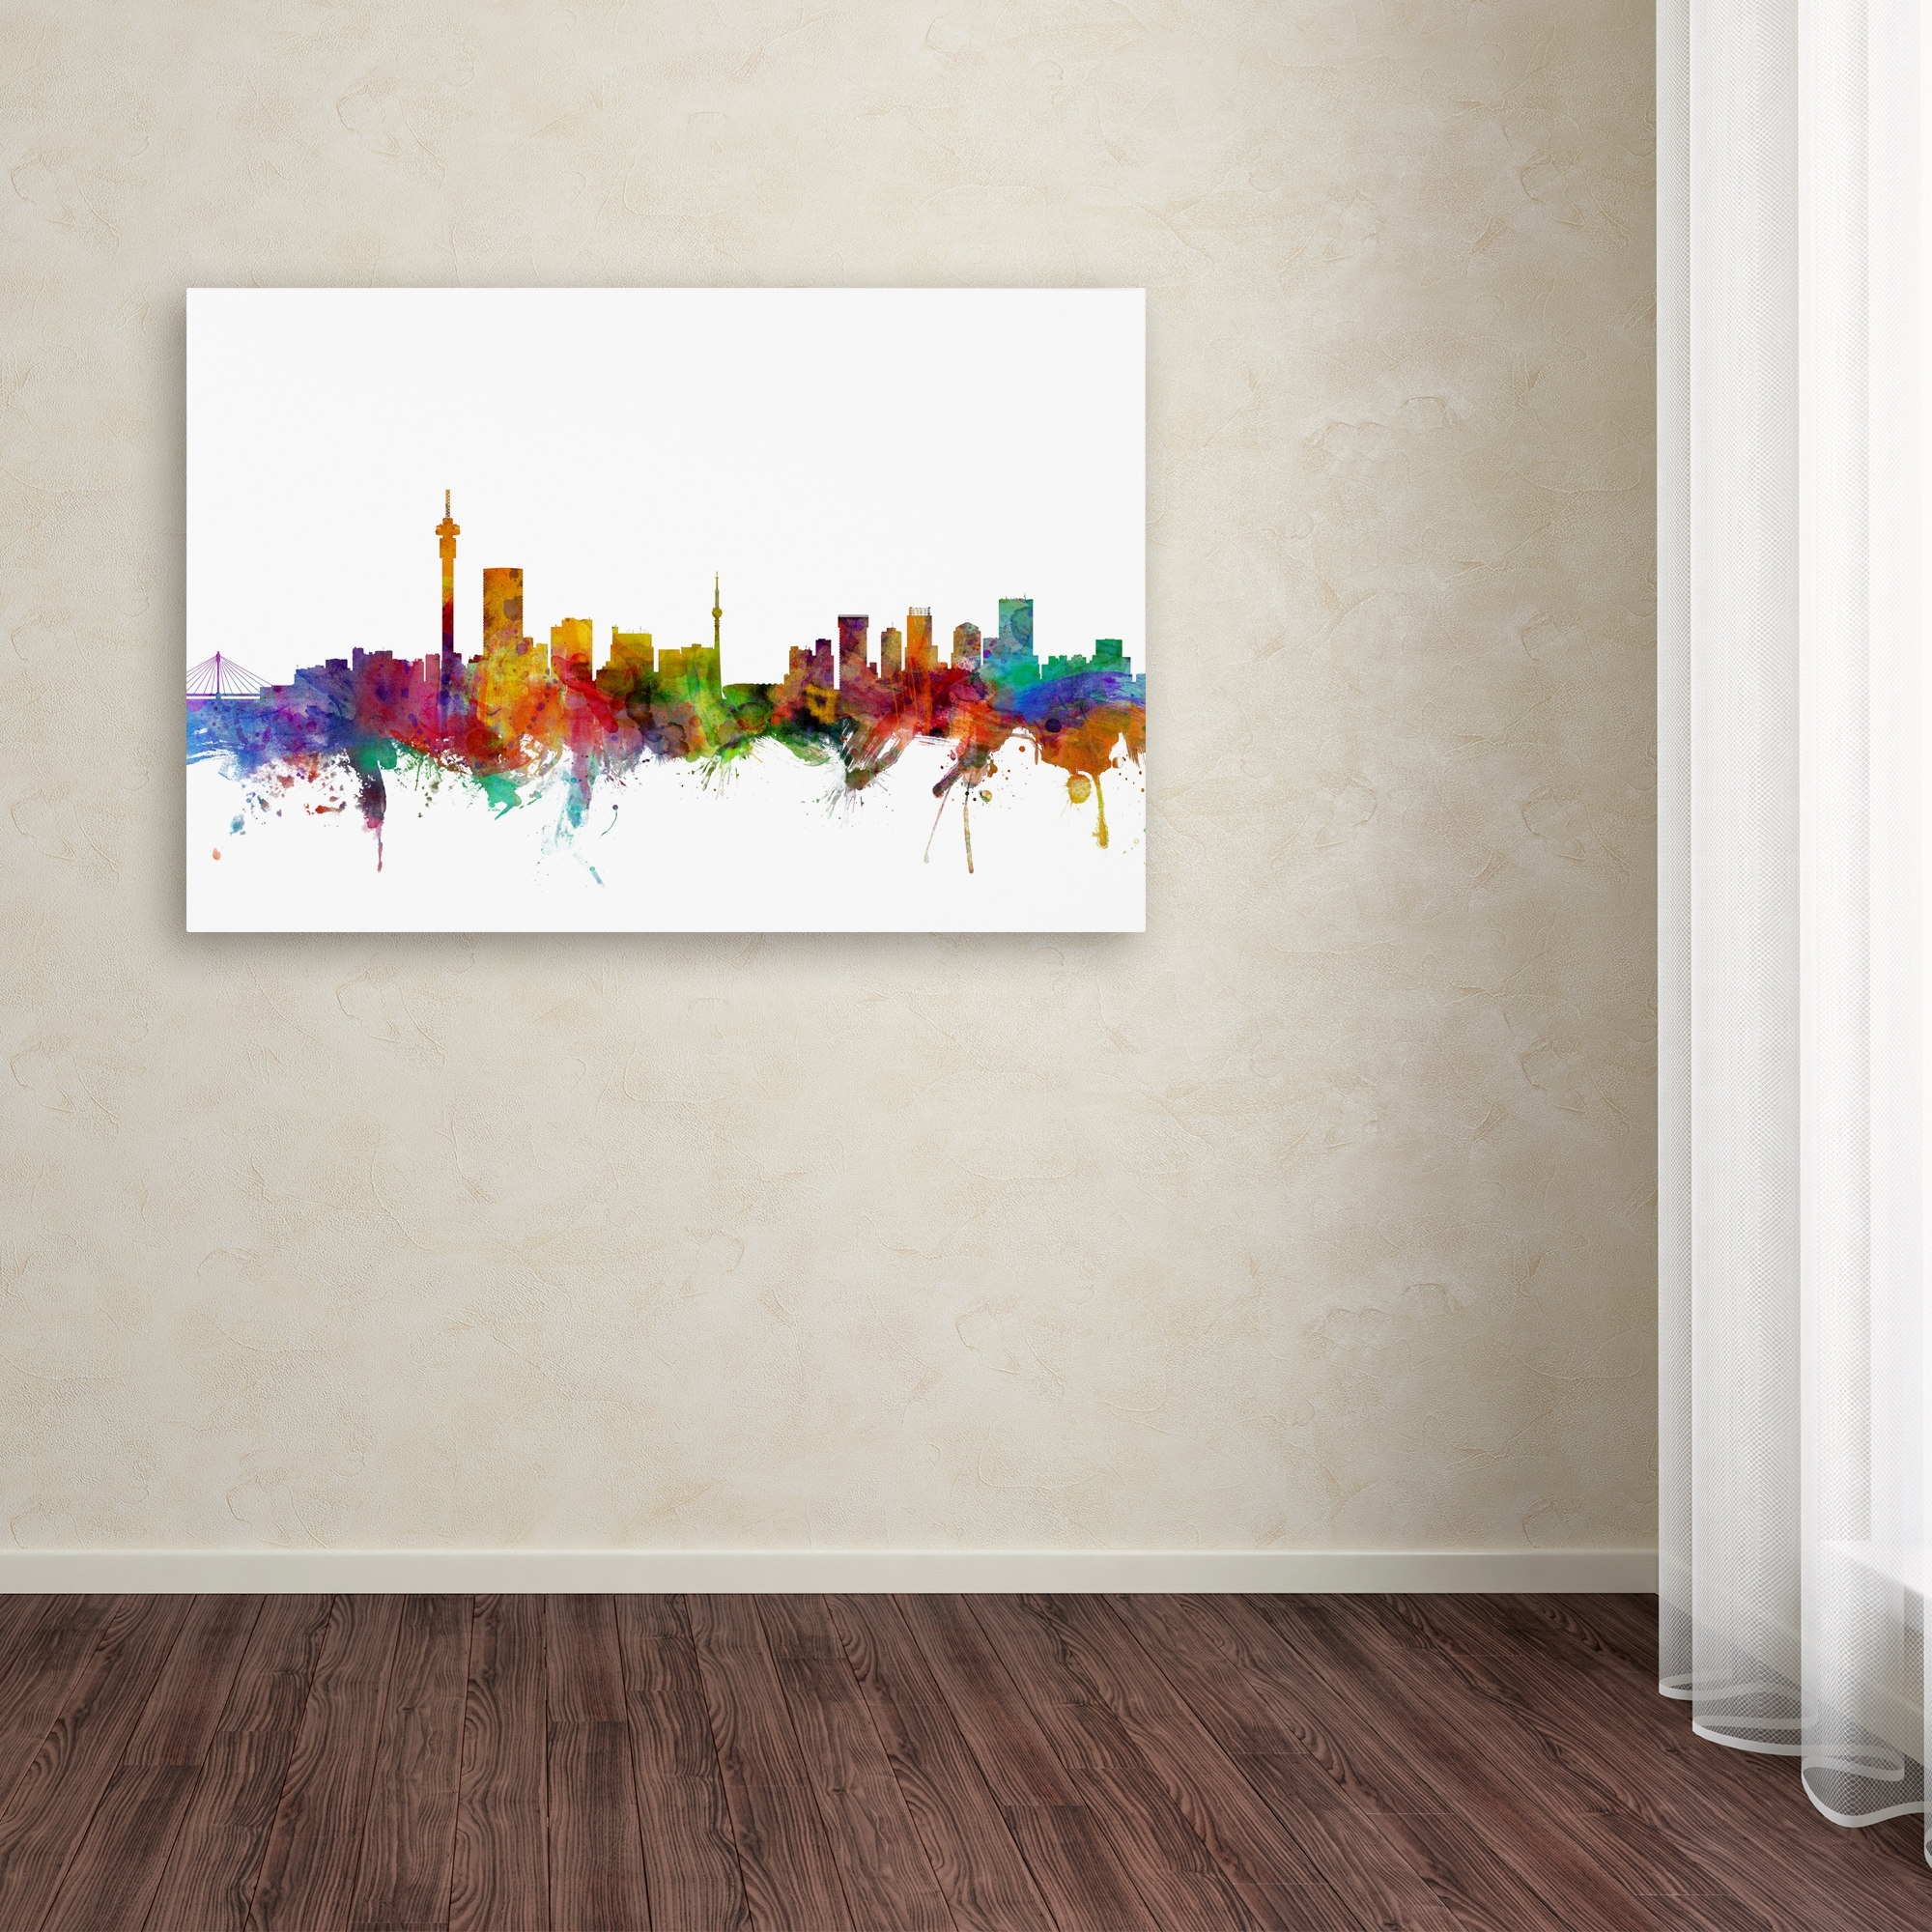 Michael Tompsett 'johannesburg South Africa Skyline' Canvas Wall Regarding Well Liked Johannesburg Canvas Wall Art (View 2 of 15)